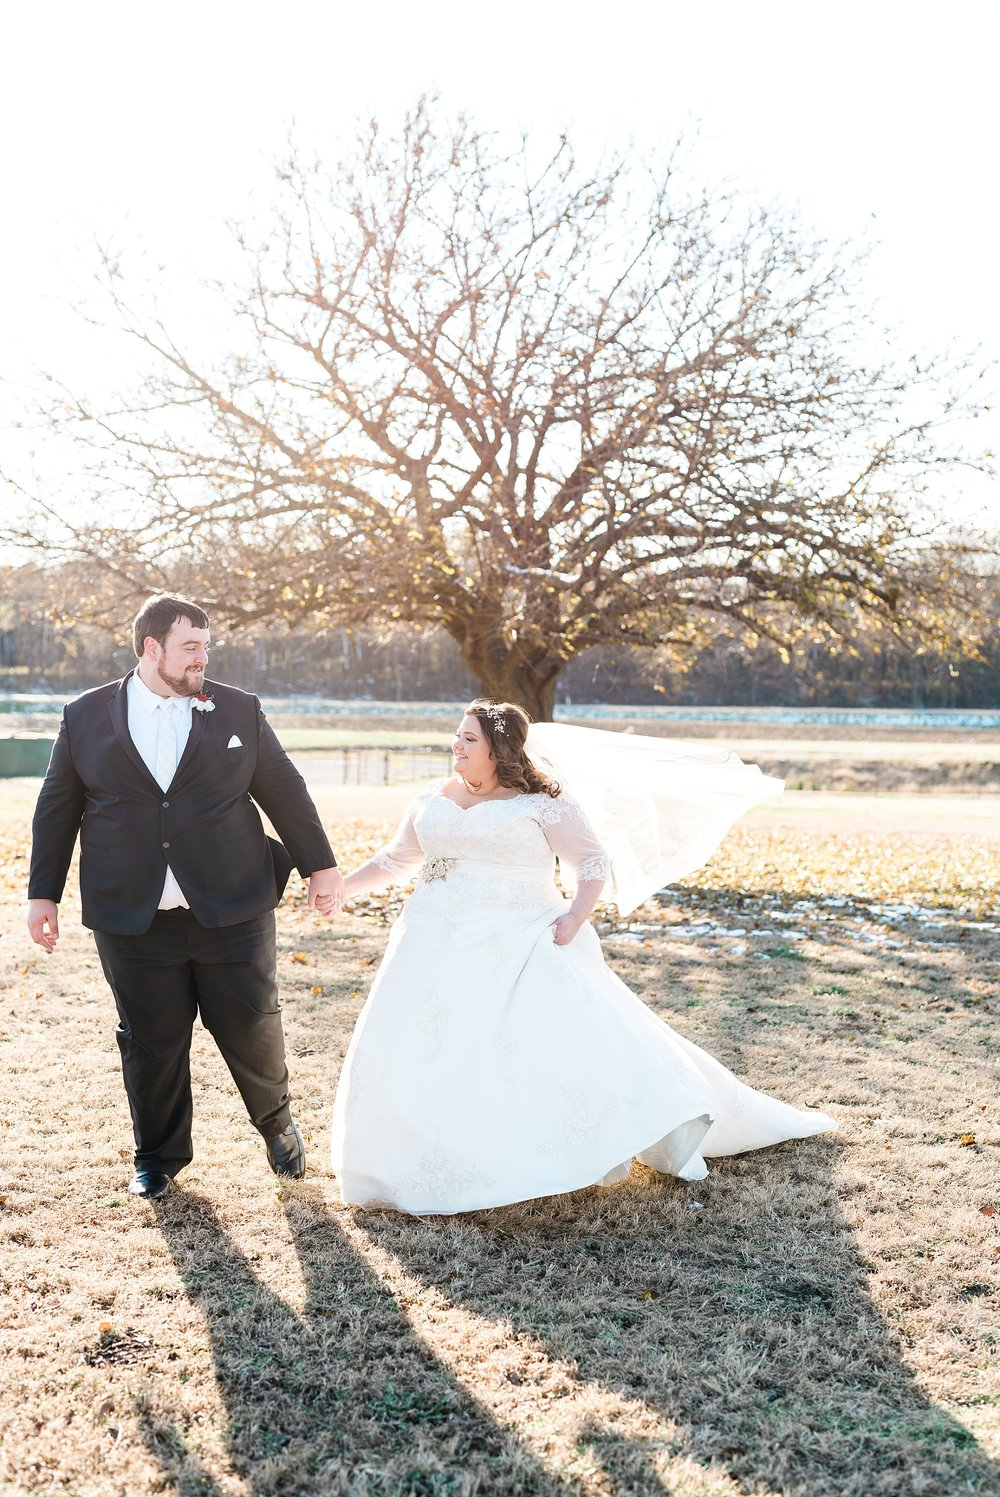 Golden Winter Wedding at The Legacy Barn in Barnett Missouri by Kelsi Kliethermes Photography Columbia Missouri Wedding Photographer_0029.jpg